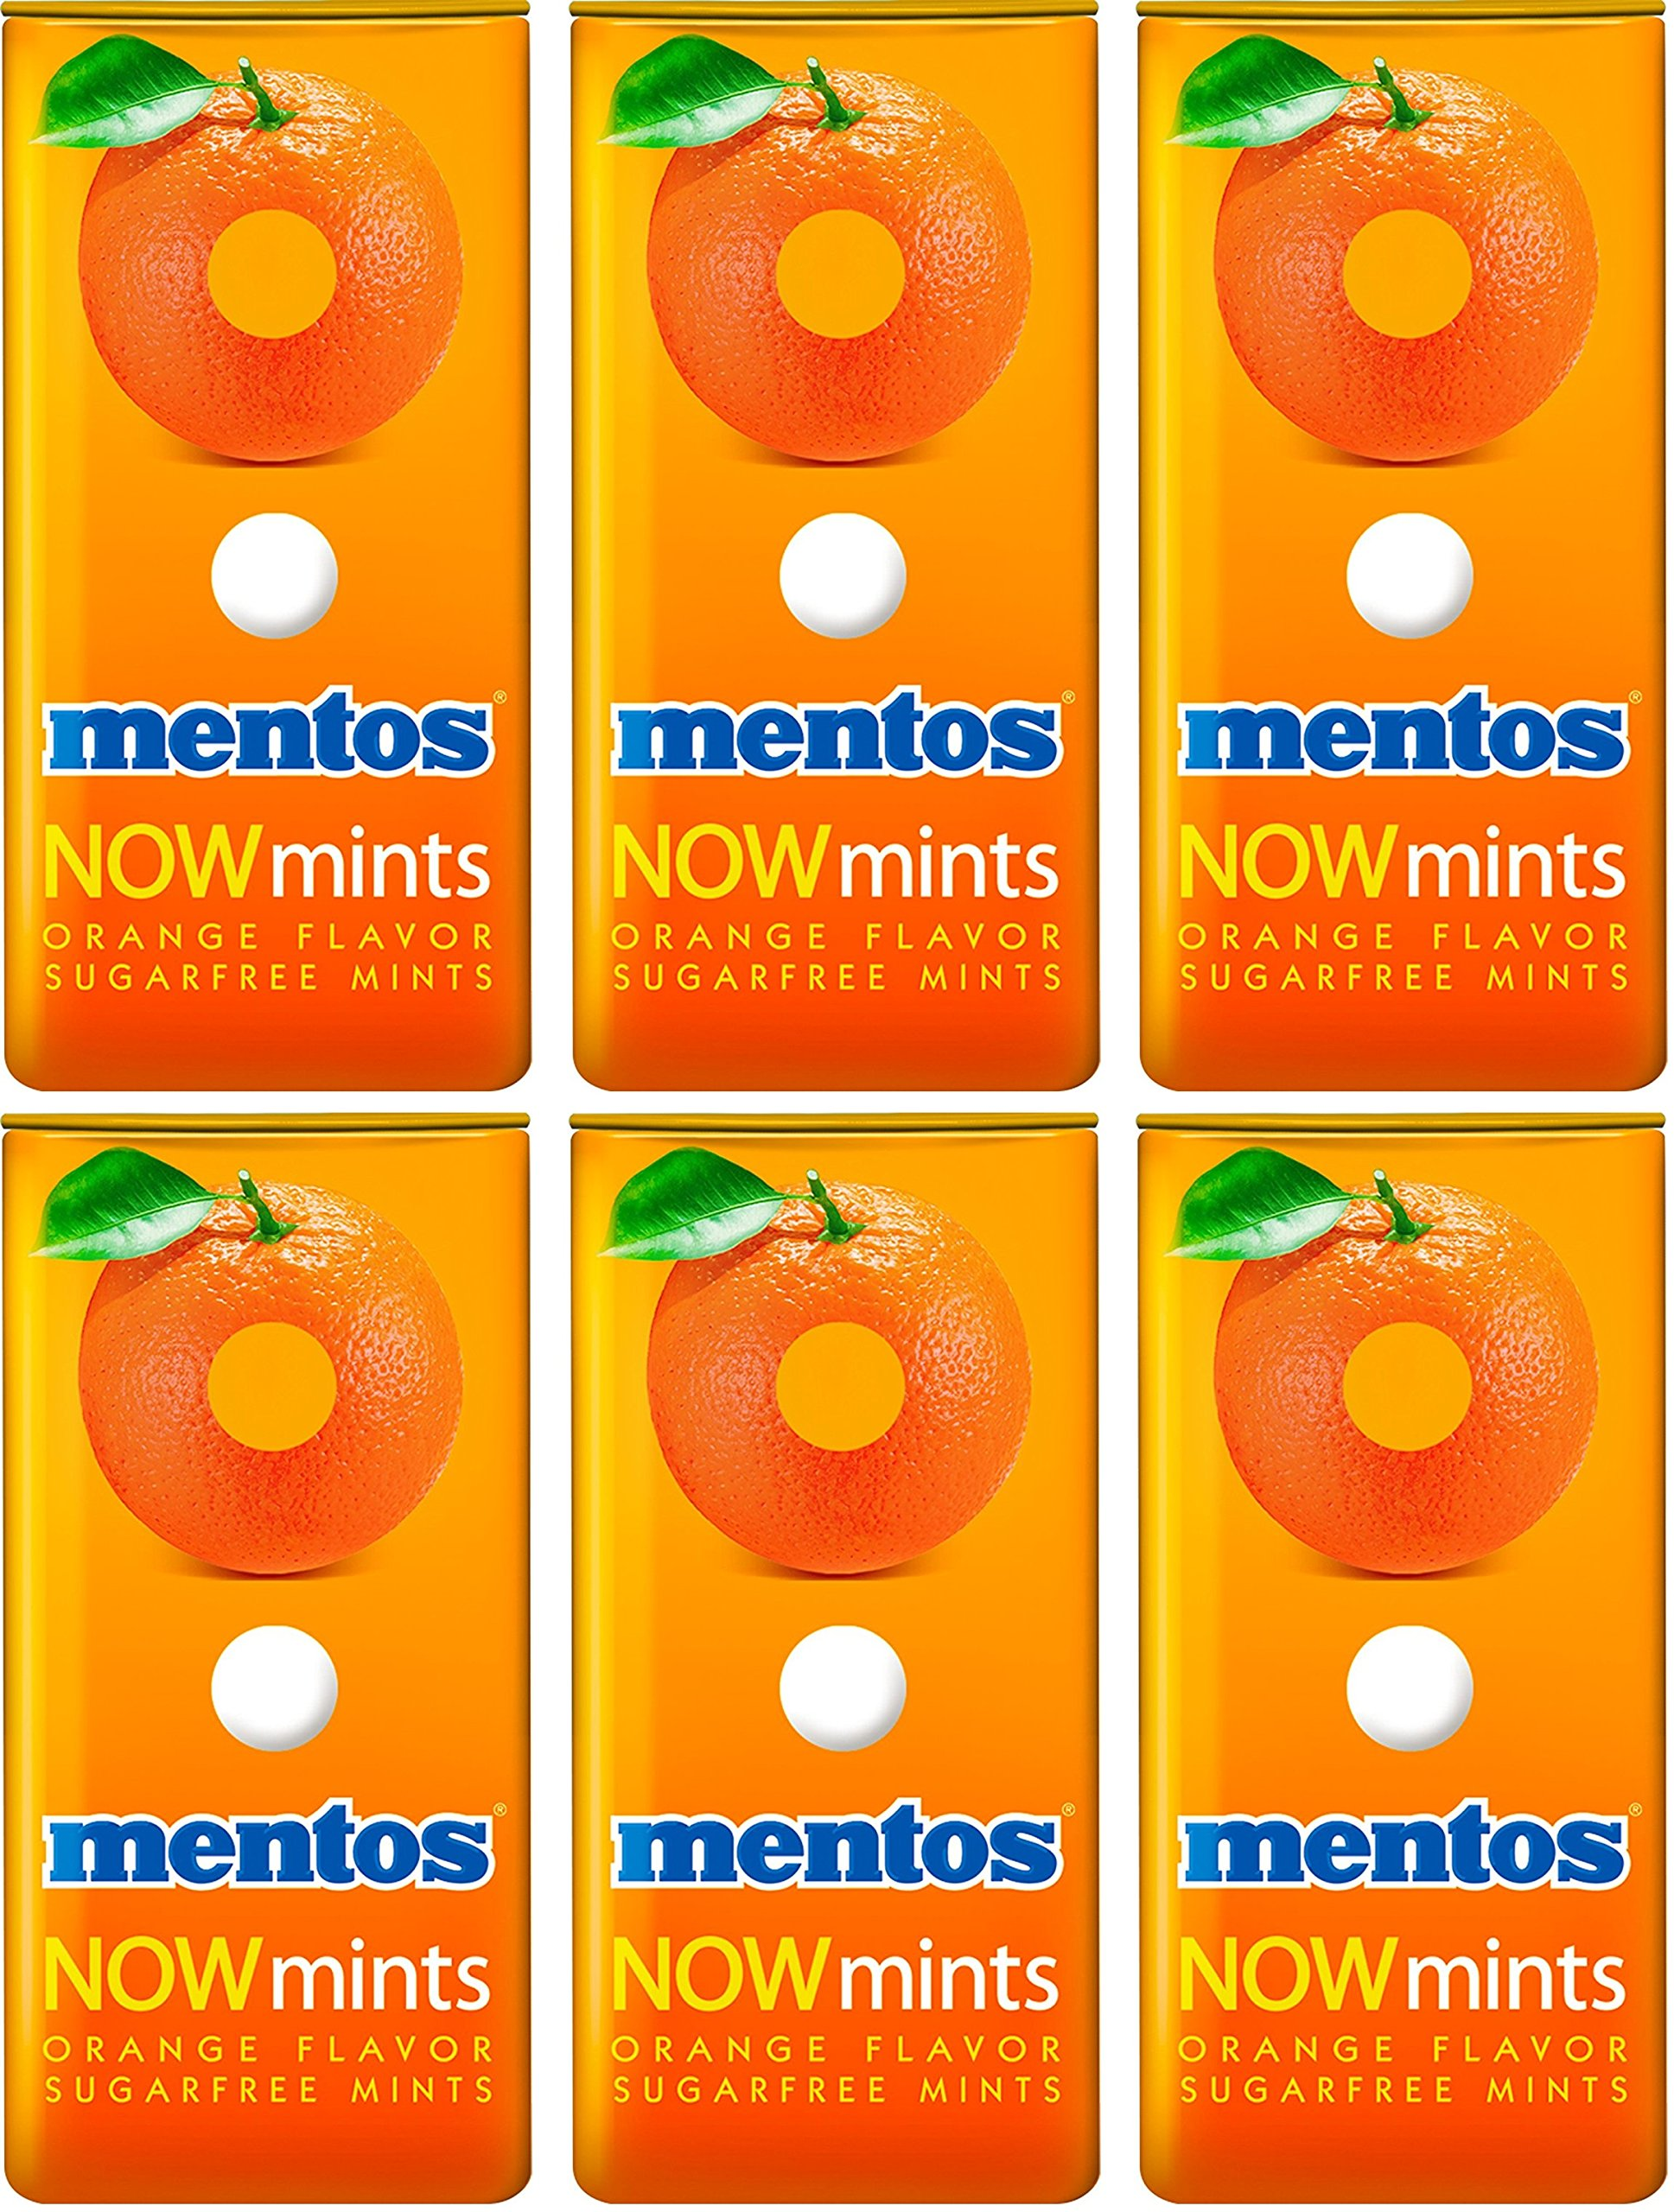 Mentos Now Mints - Orange - Sugar Free - Net Wt. 1.09 OZ (31 g) Each - Pack of 6